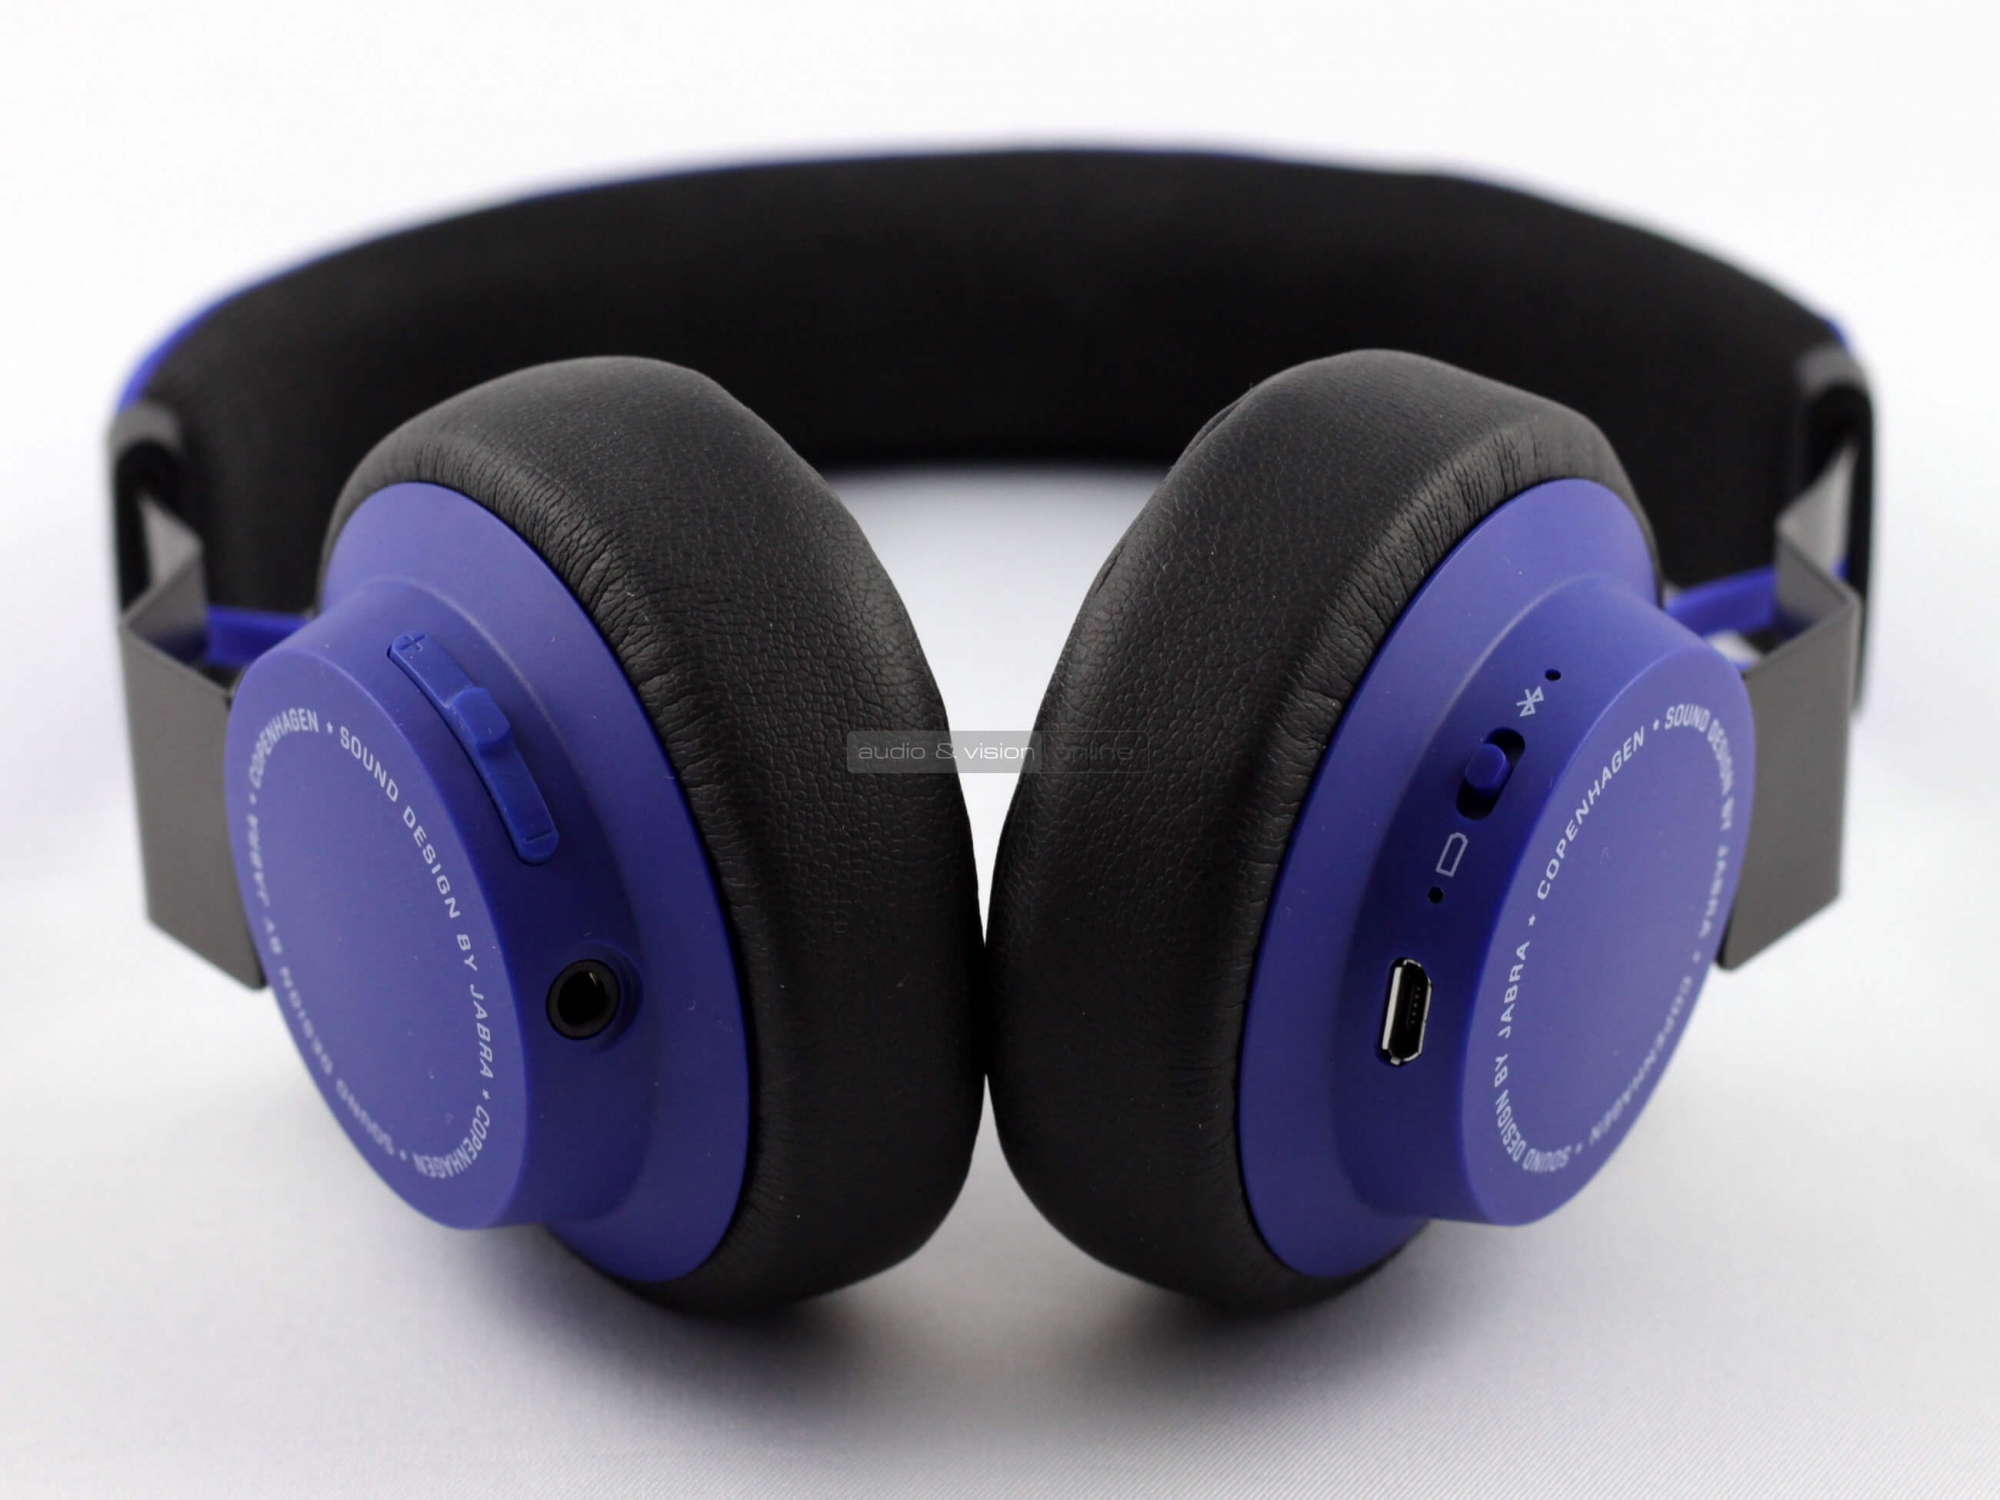 Jabra Move Wireless Bluetooth fejhallgató teszt  c72bb16c85